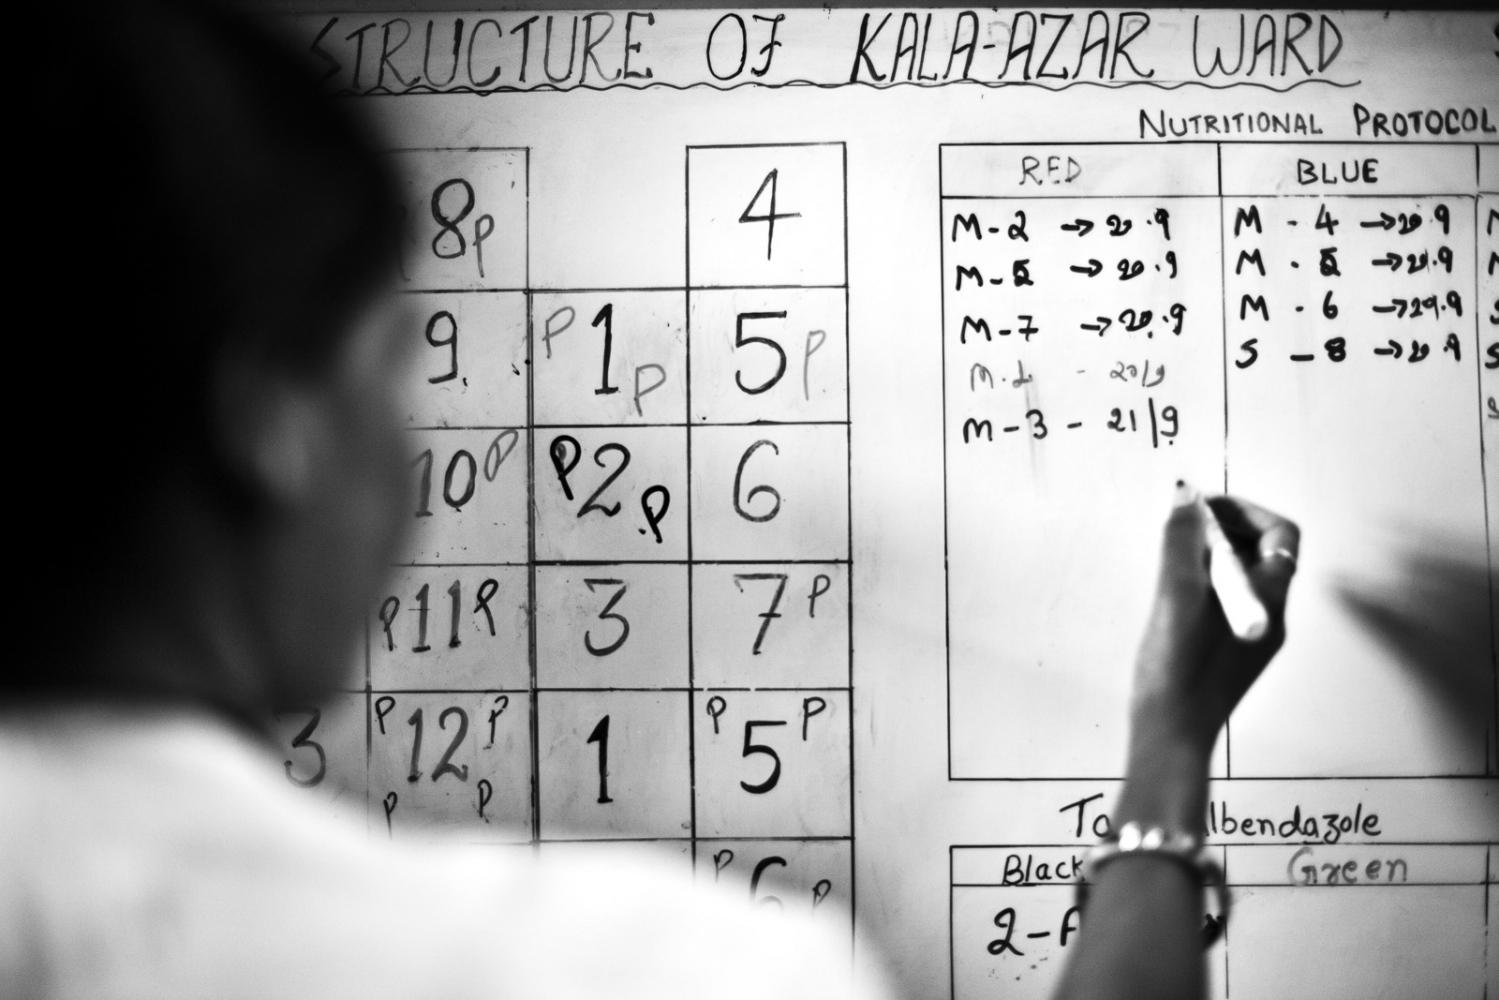 Art and Documentary Photography - Loading Kala Azar - black fever - fiebre negra - Leishmaniasis - David Rengel-13.jpg